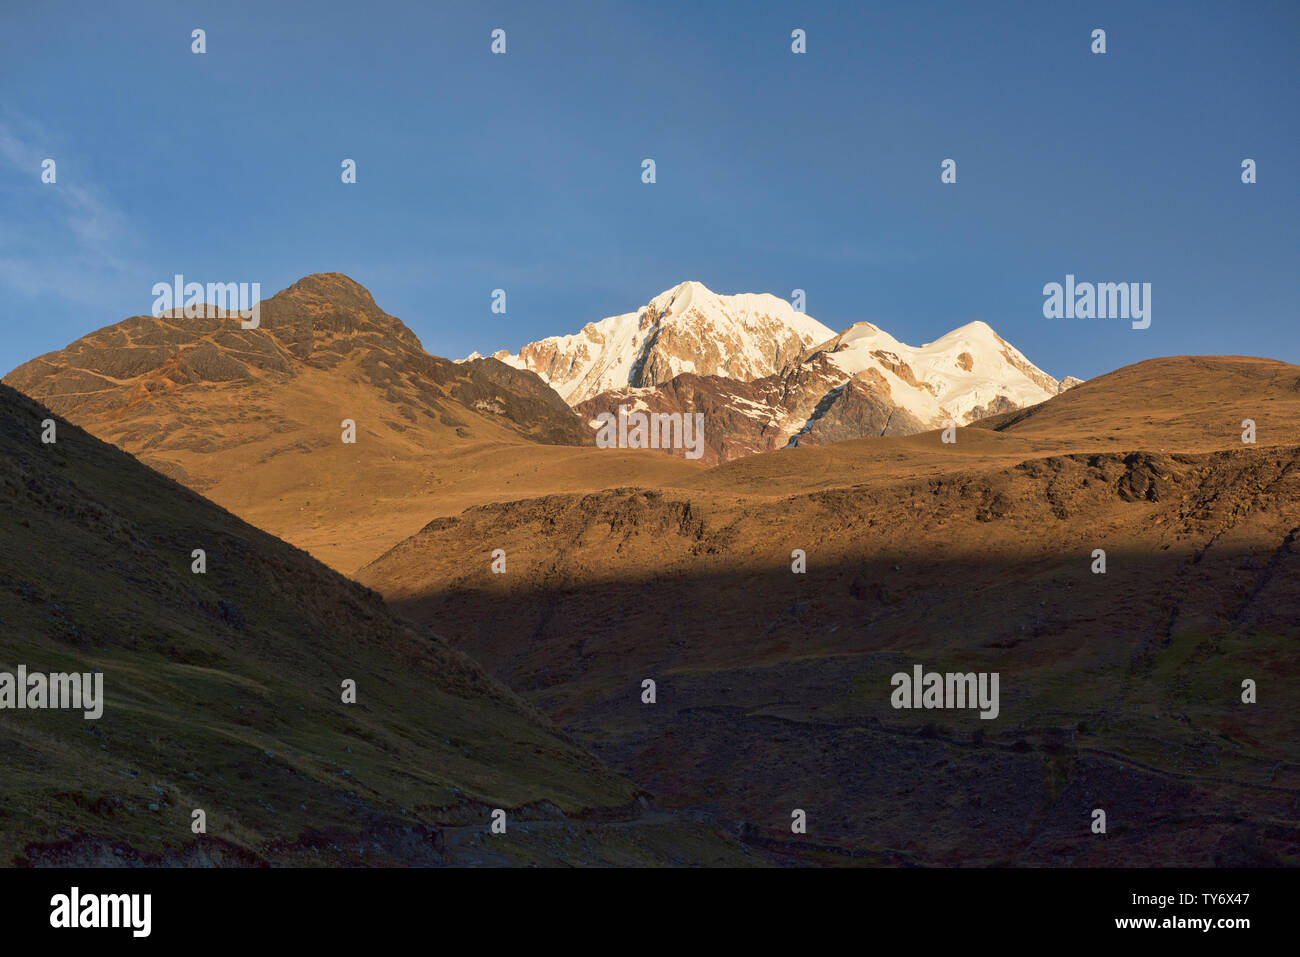 Illampu at sunset, Cordillera Real Traverse, Bolivia - Stock Image